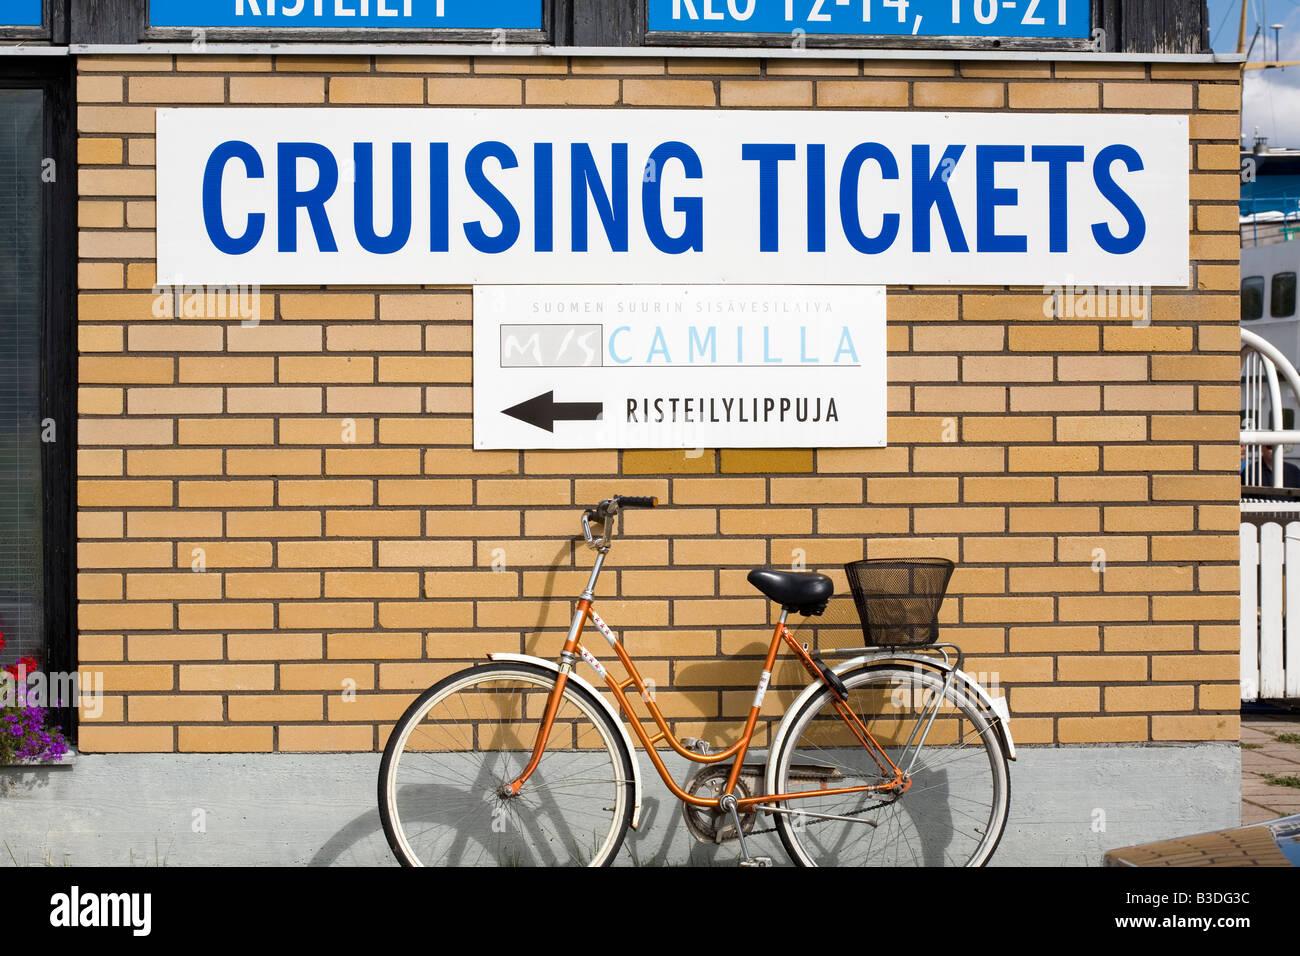 Cruising tickets sign - Stock Image